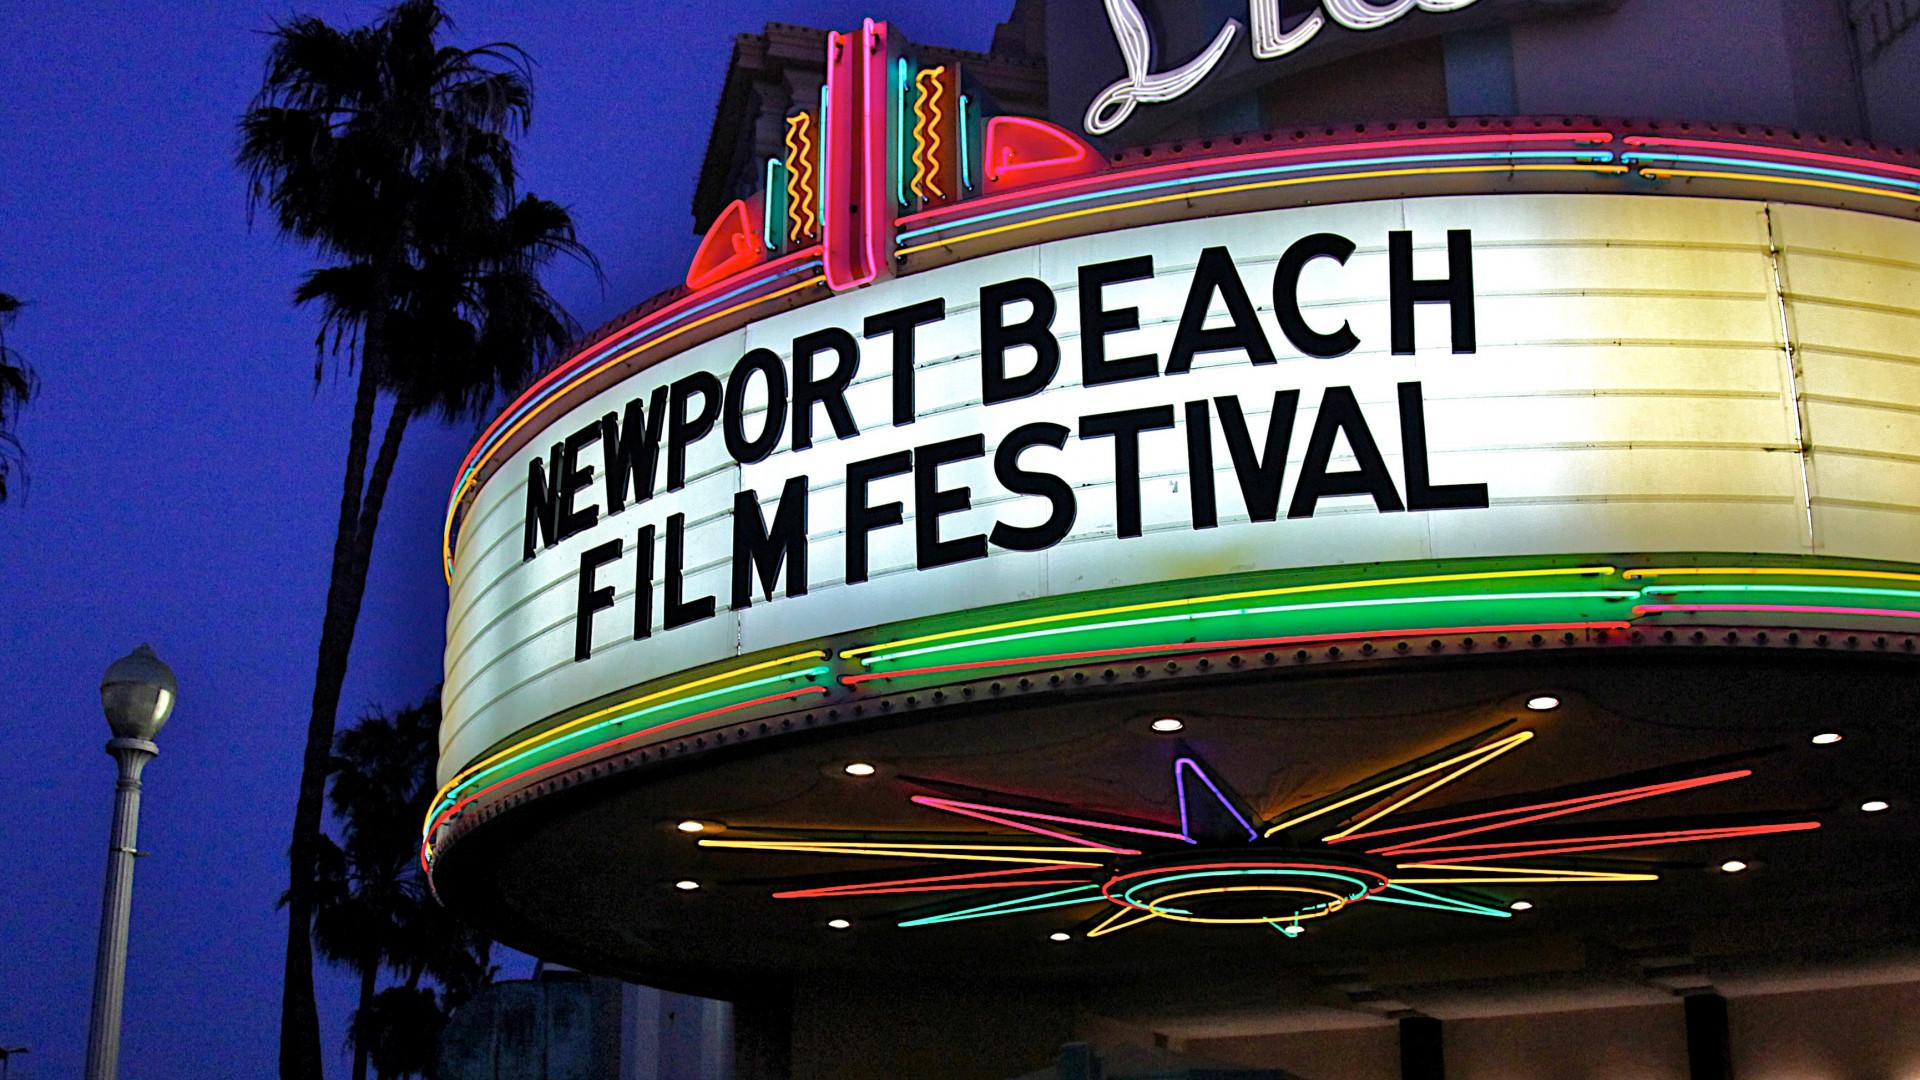 Newport Beach, Southern California